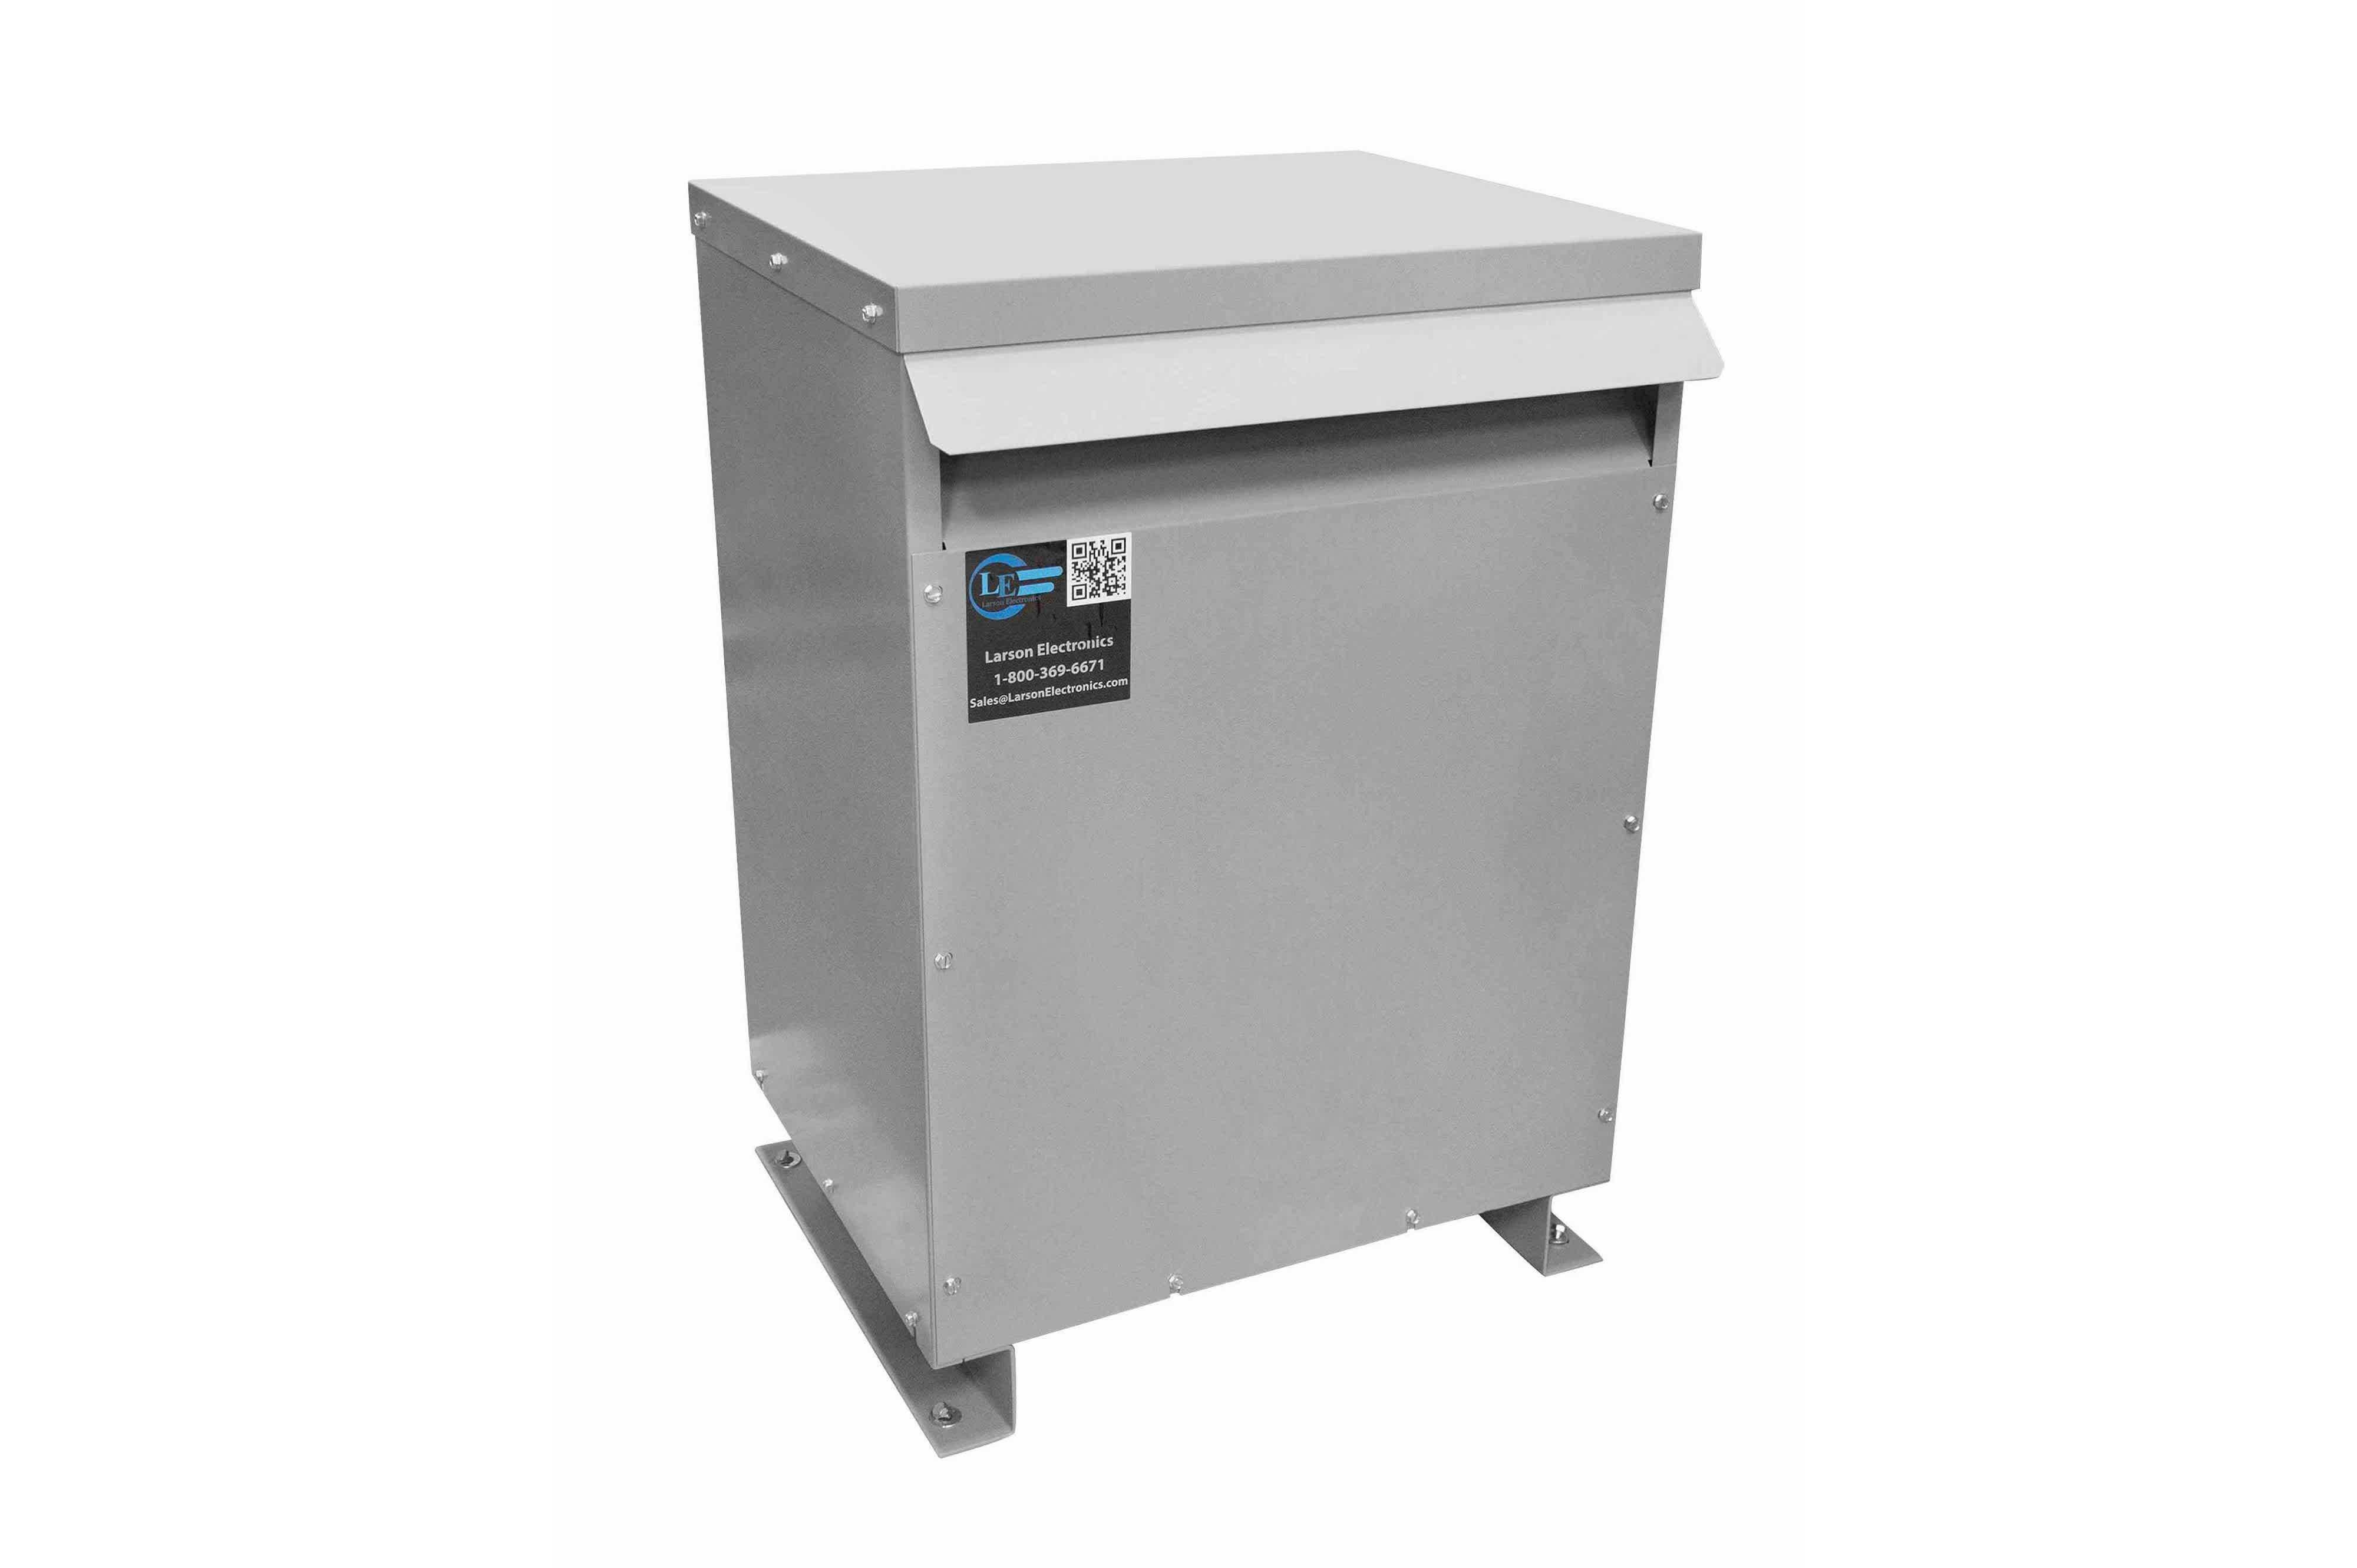 800 kVA 3PH DOE Transformer, 400V Delta Primary, 600Y/347 Wye-N Secondary, N3R, Ventilated, 60 Hz